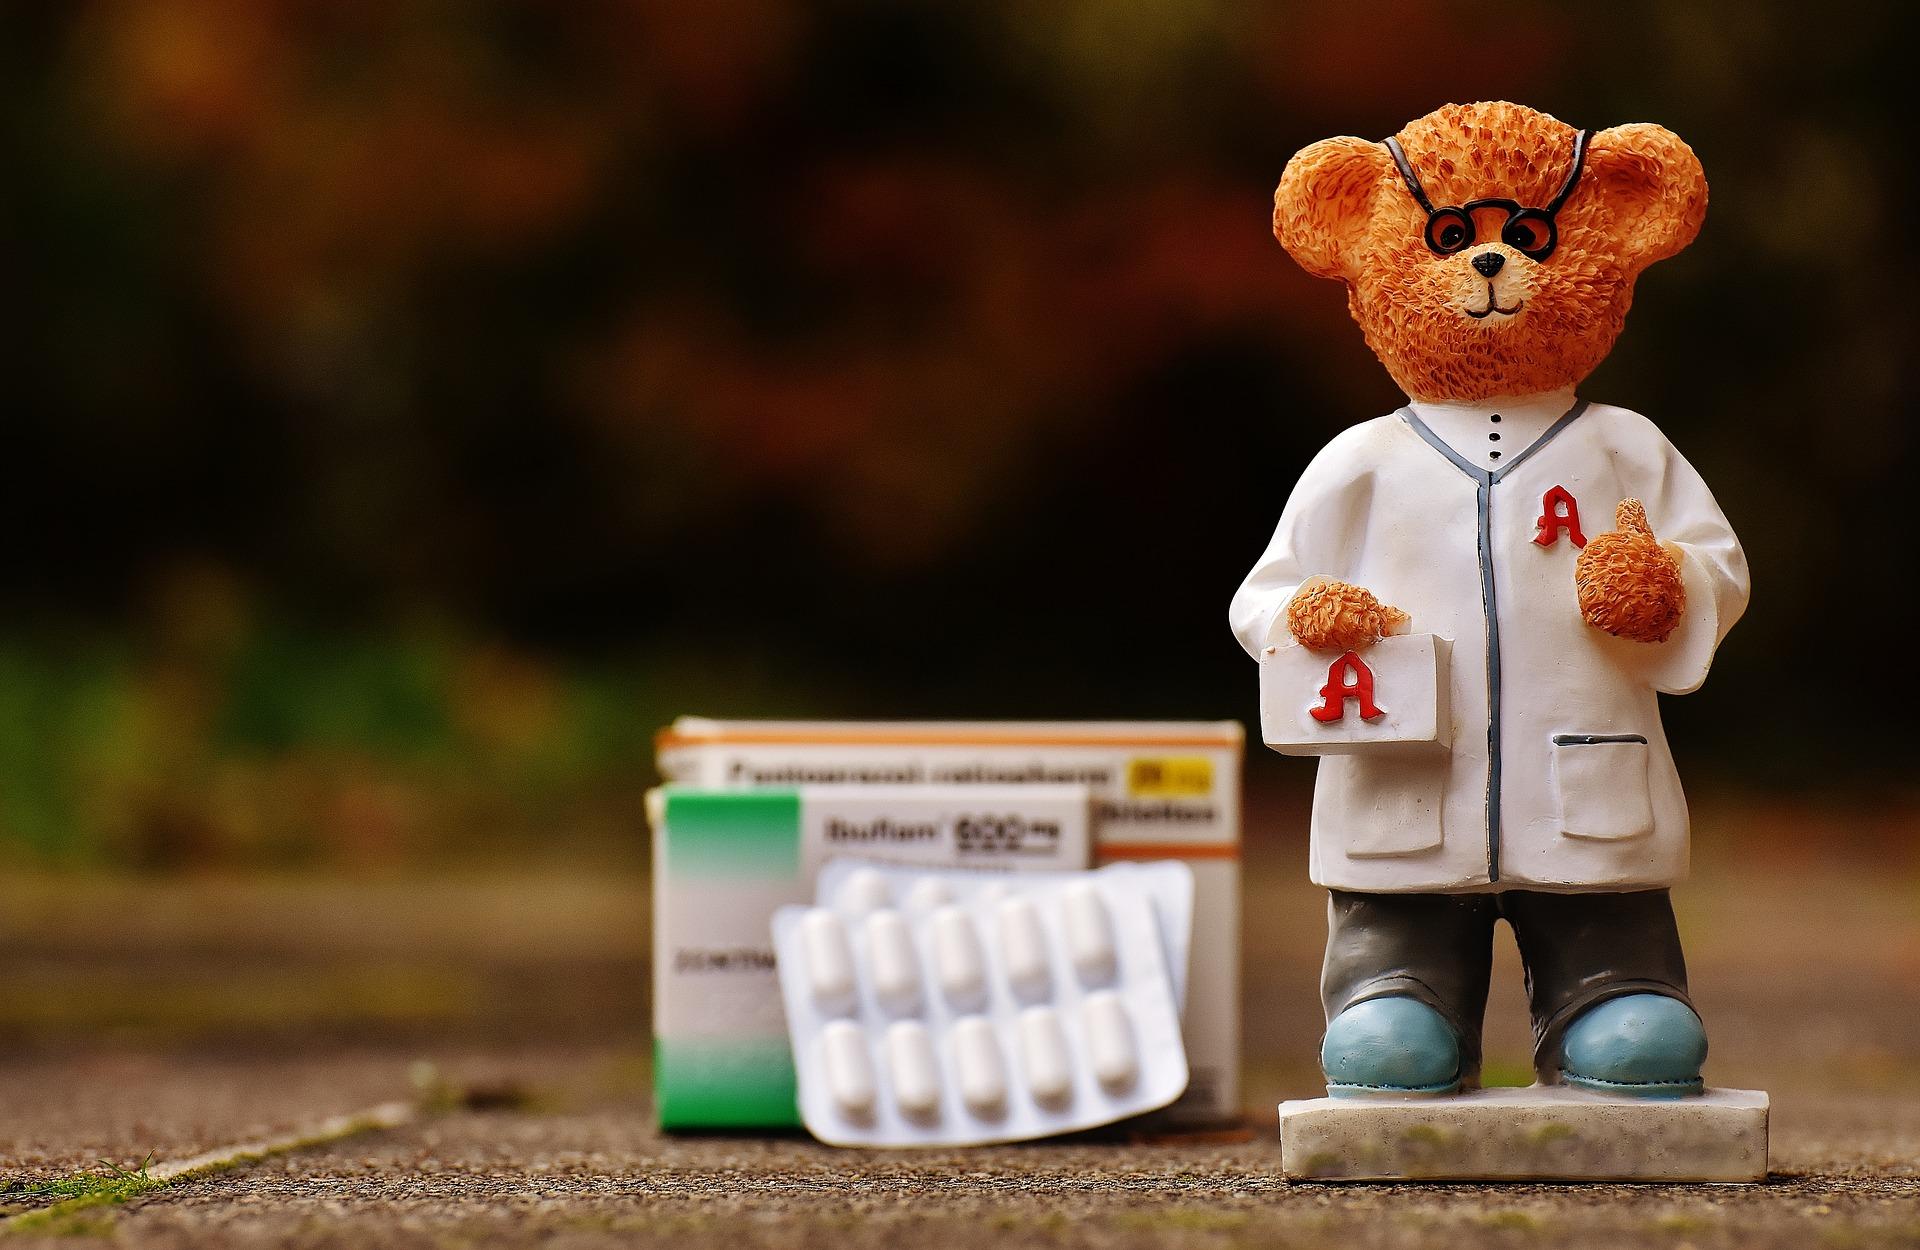 Coronavirus Bulk-Billed Health Services